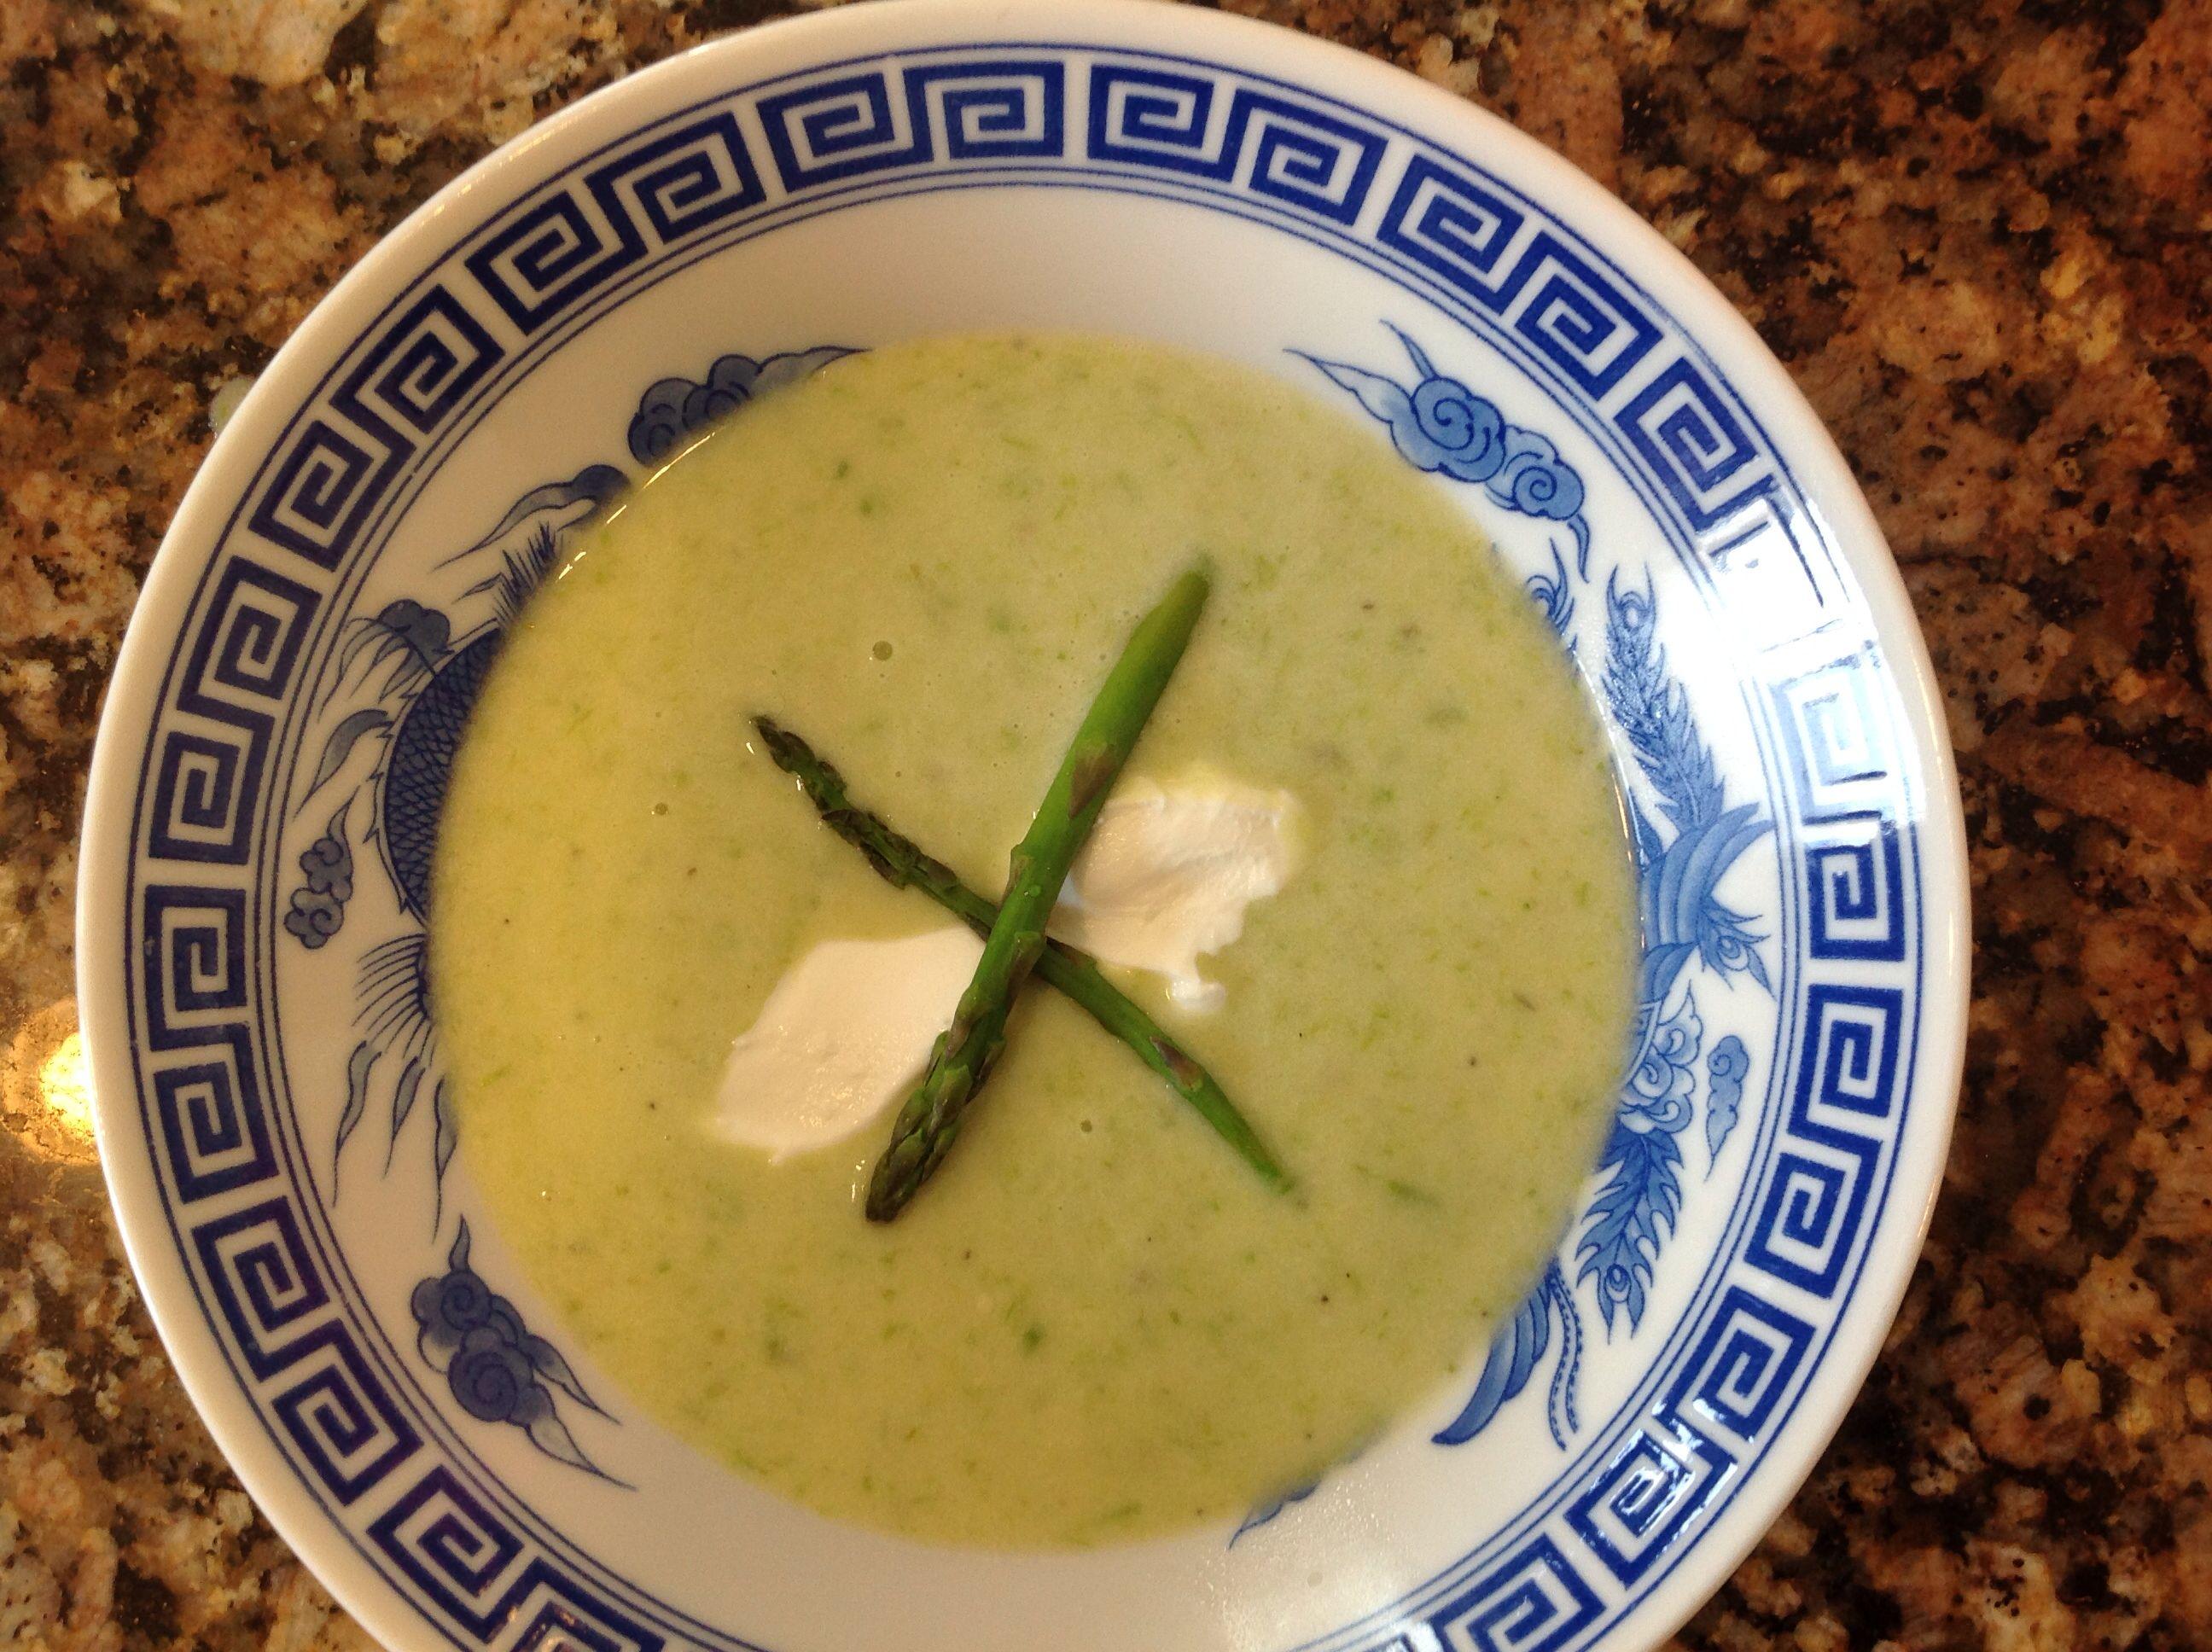 Cream of asparagus soup using a white cream soup base of